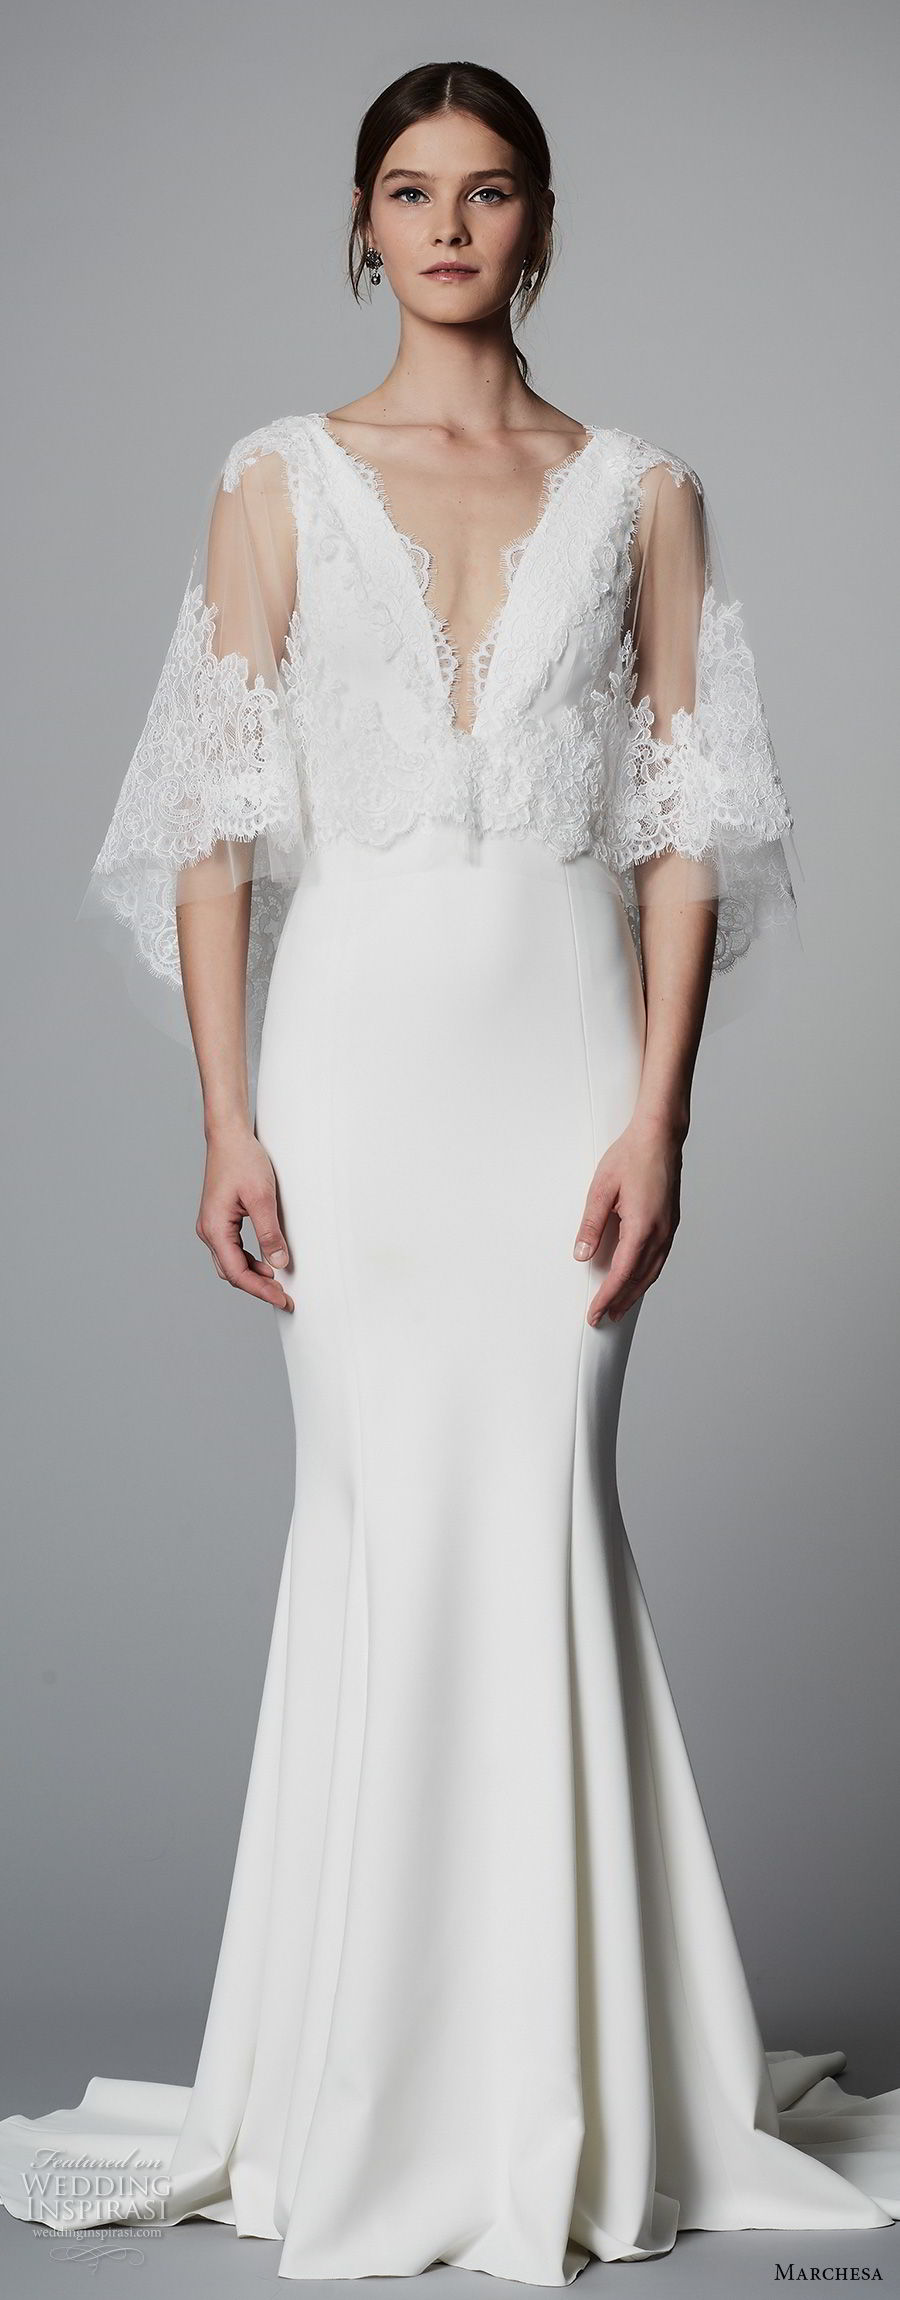 marchesa spring 2018 bridal half bell sleeves deep v neck heavily embellished bodice elegant fit and flare wedding dress sweep train (13) mv